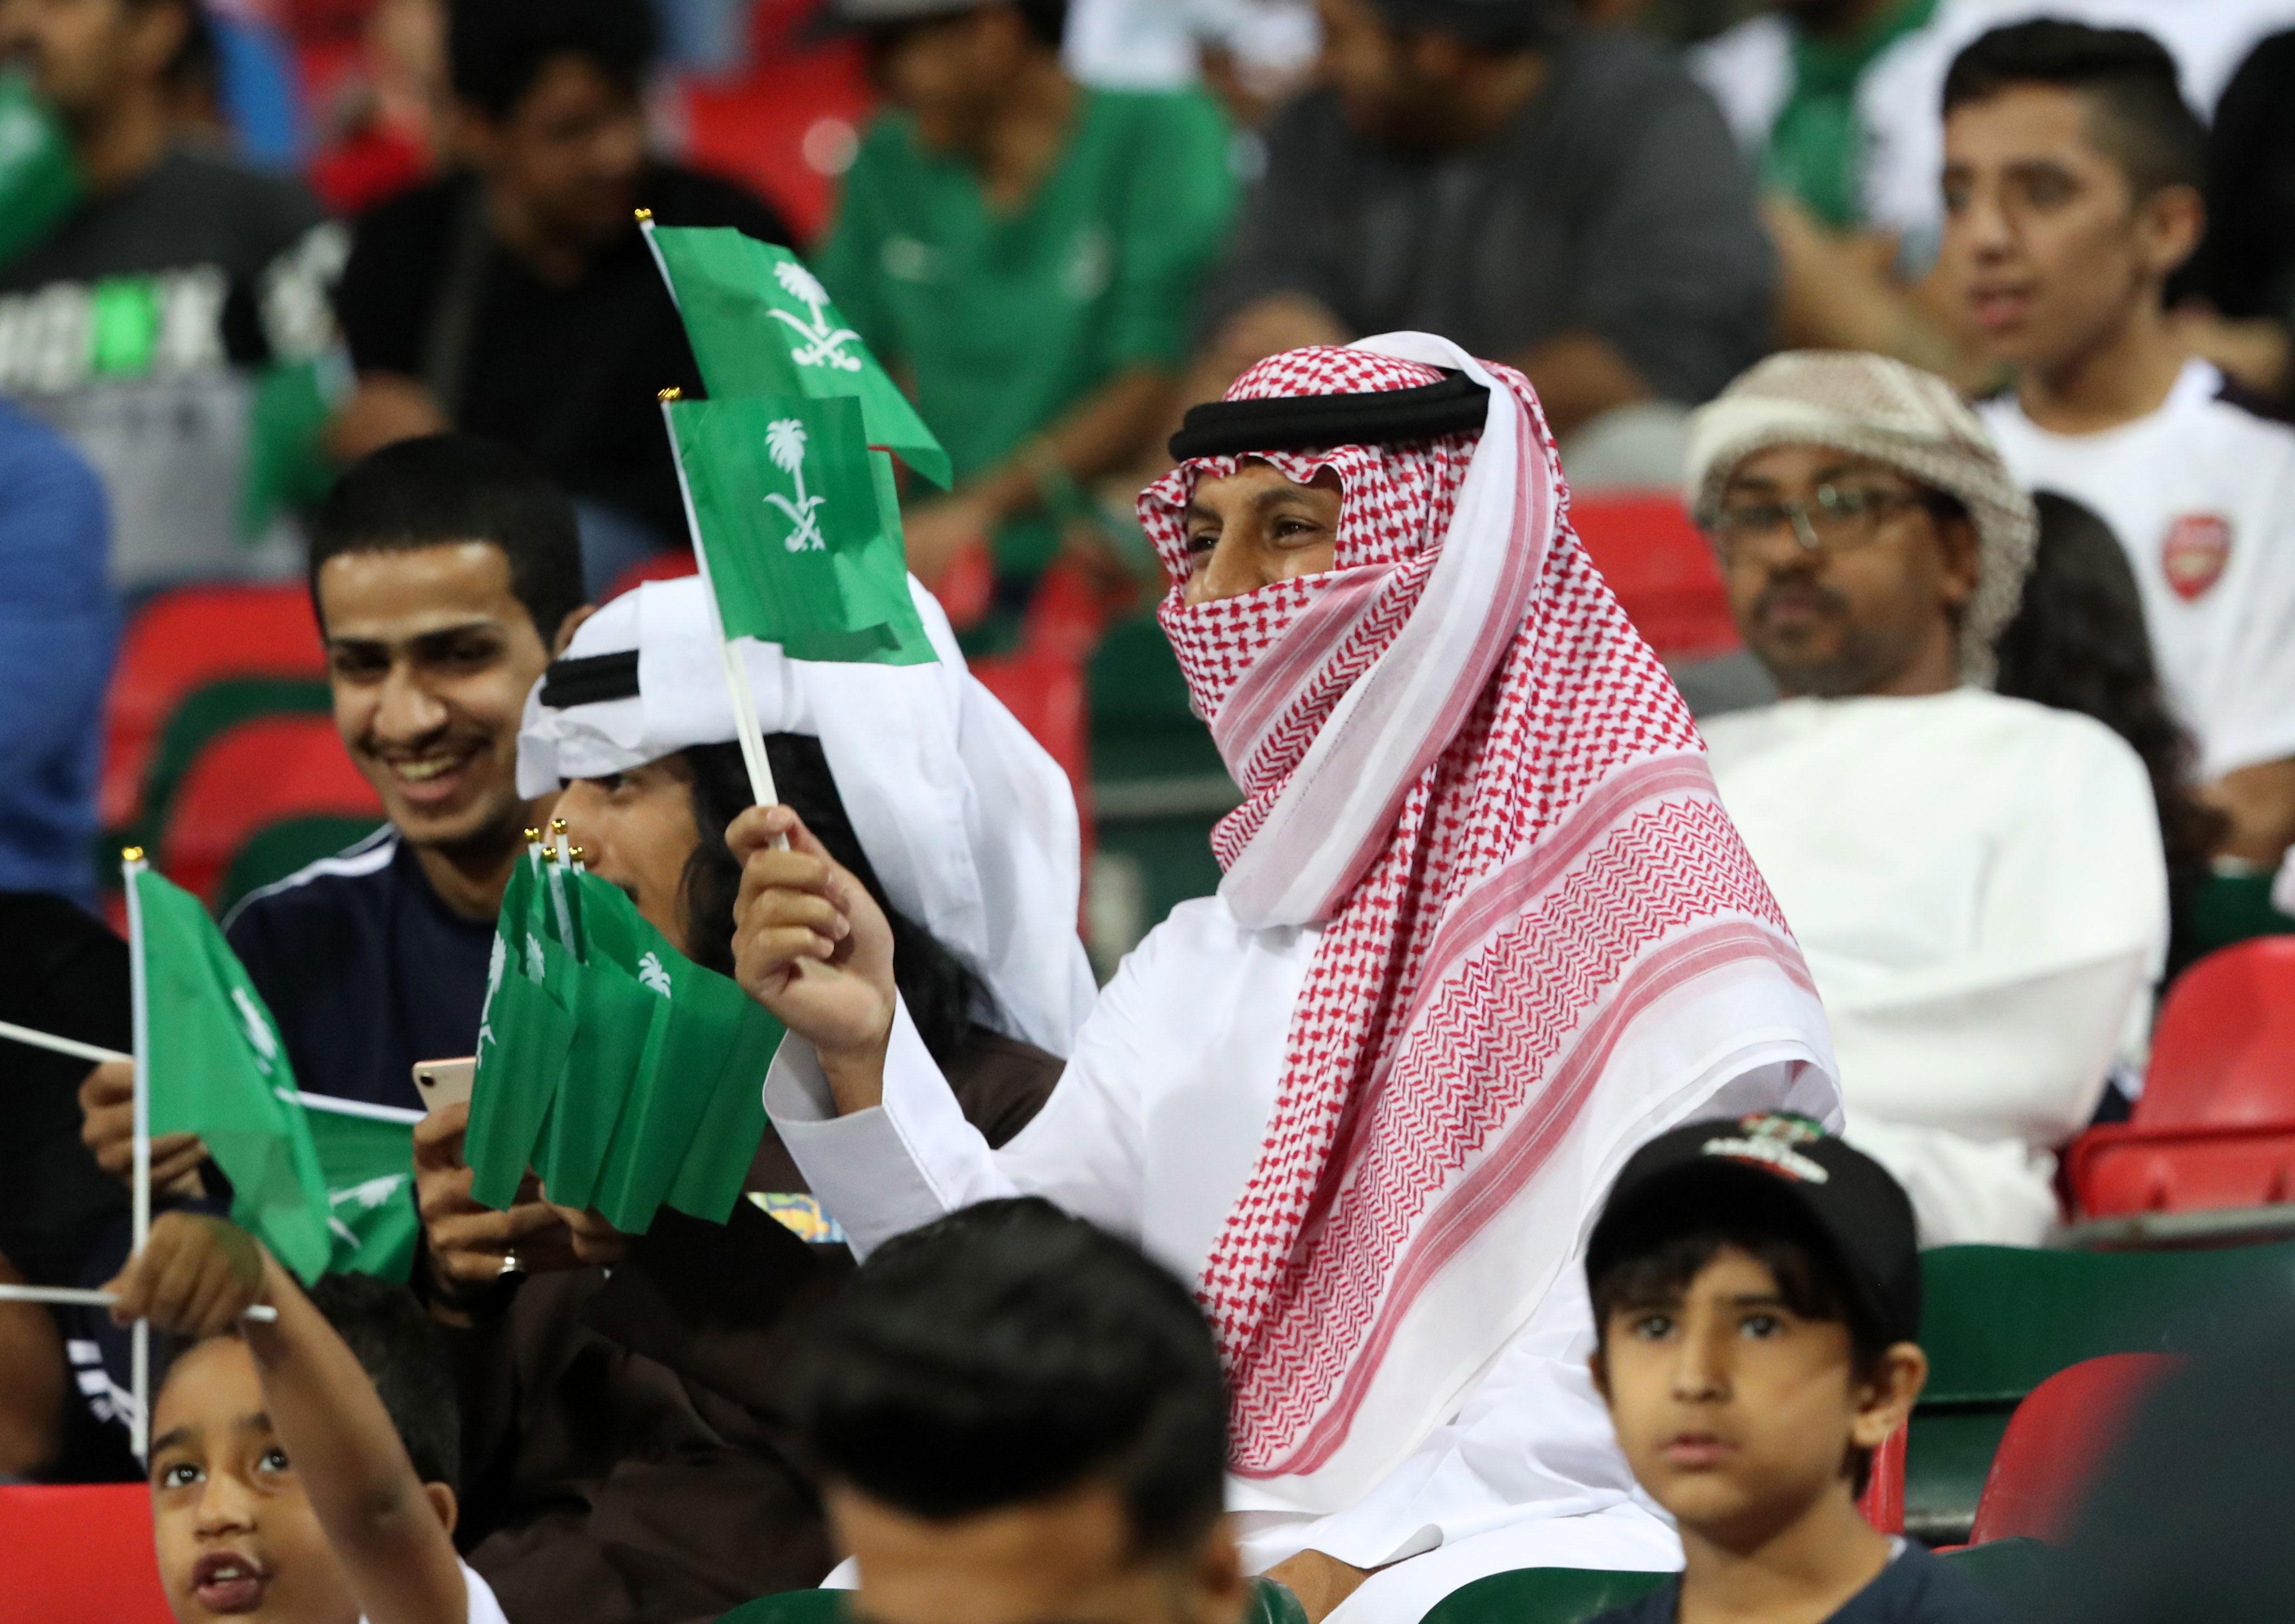 Saudi Arabia vs  Qatar Moves to the Soccer Field - Bloomberg